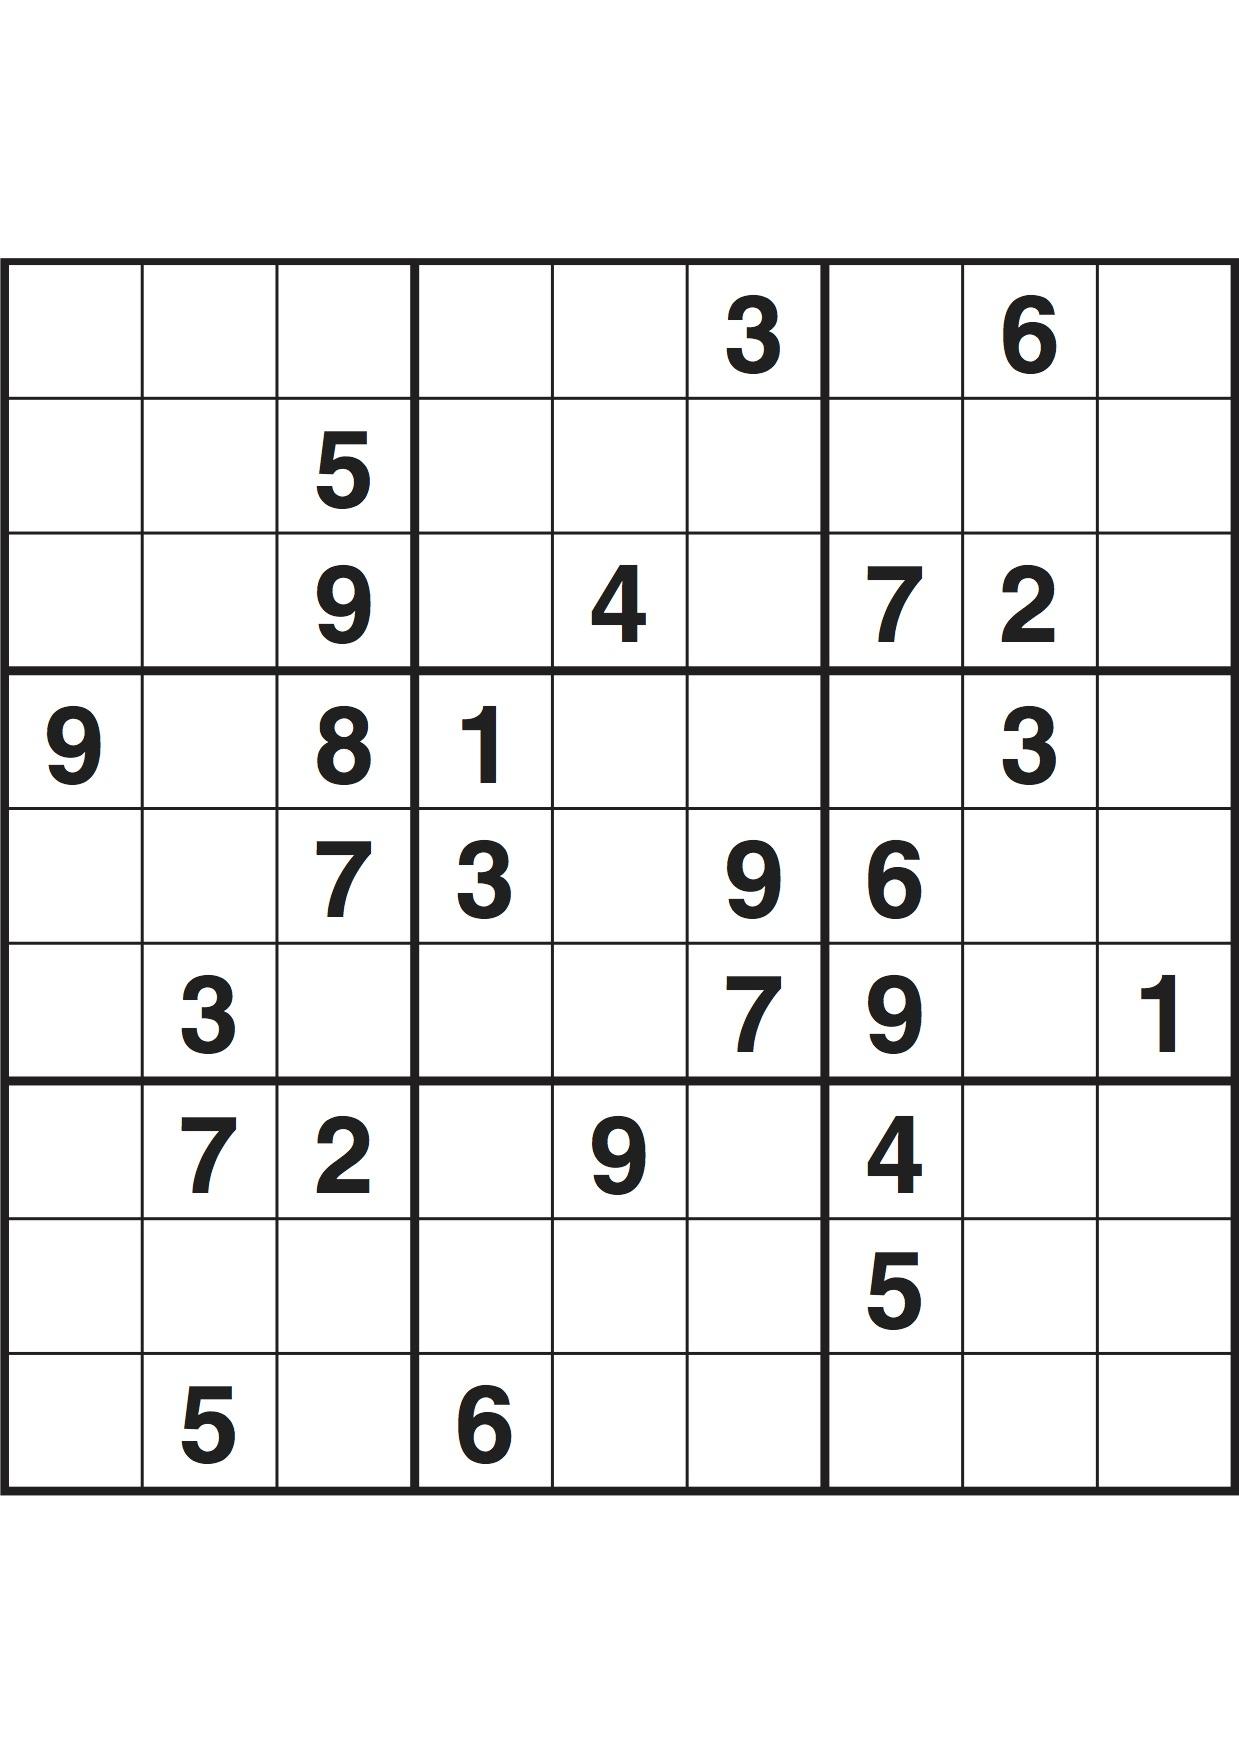 Sudoku June 2017 Online Pdf - Ielts General Reading Books dedans Sudoku Junior À Imprimer